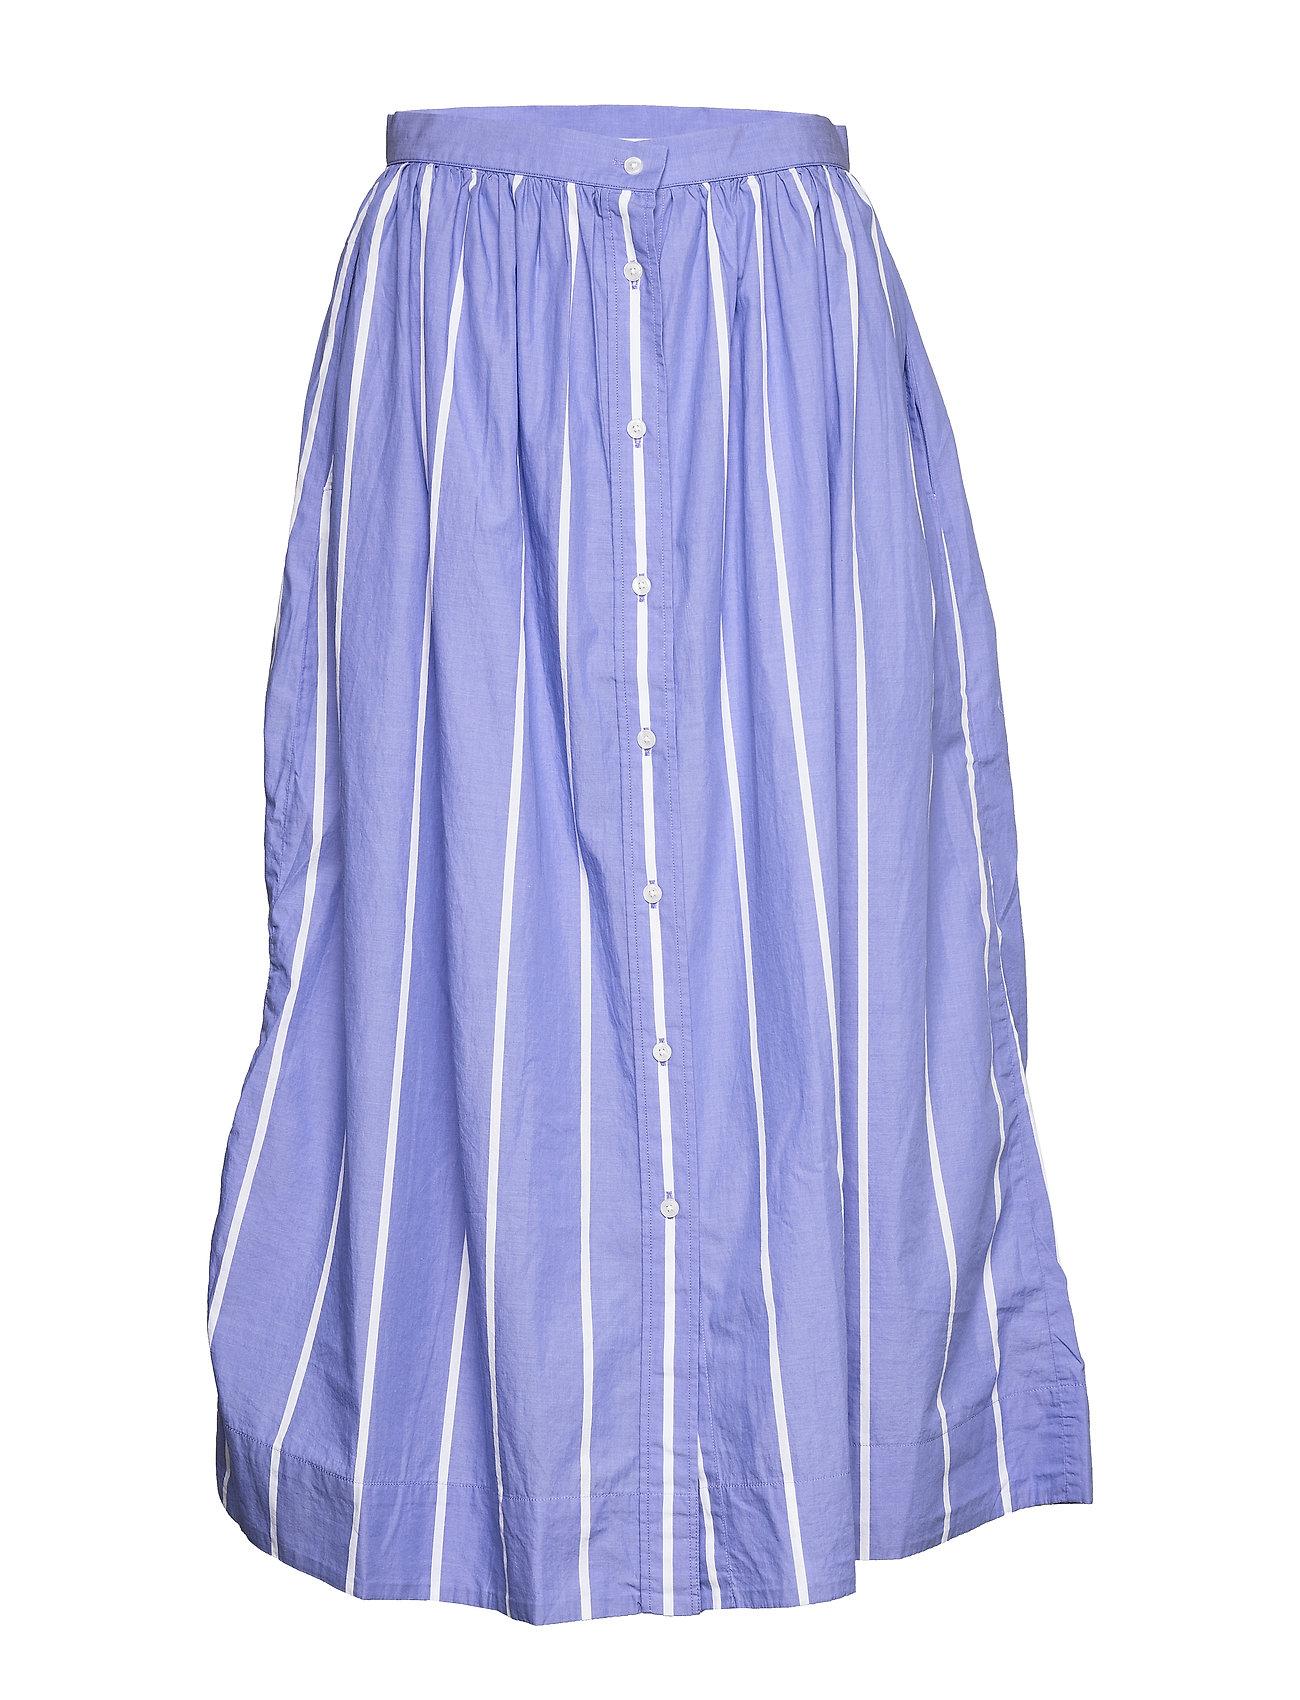 Gant D2. STRIPED SHIRT SKIRT - PERIWINKLE BLUE